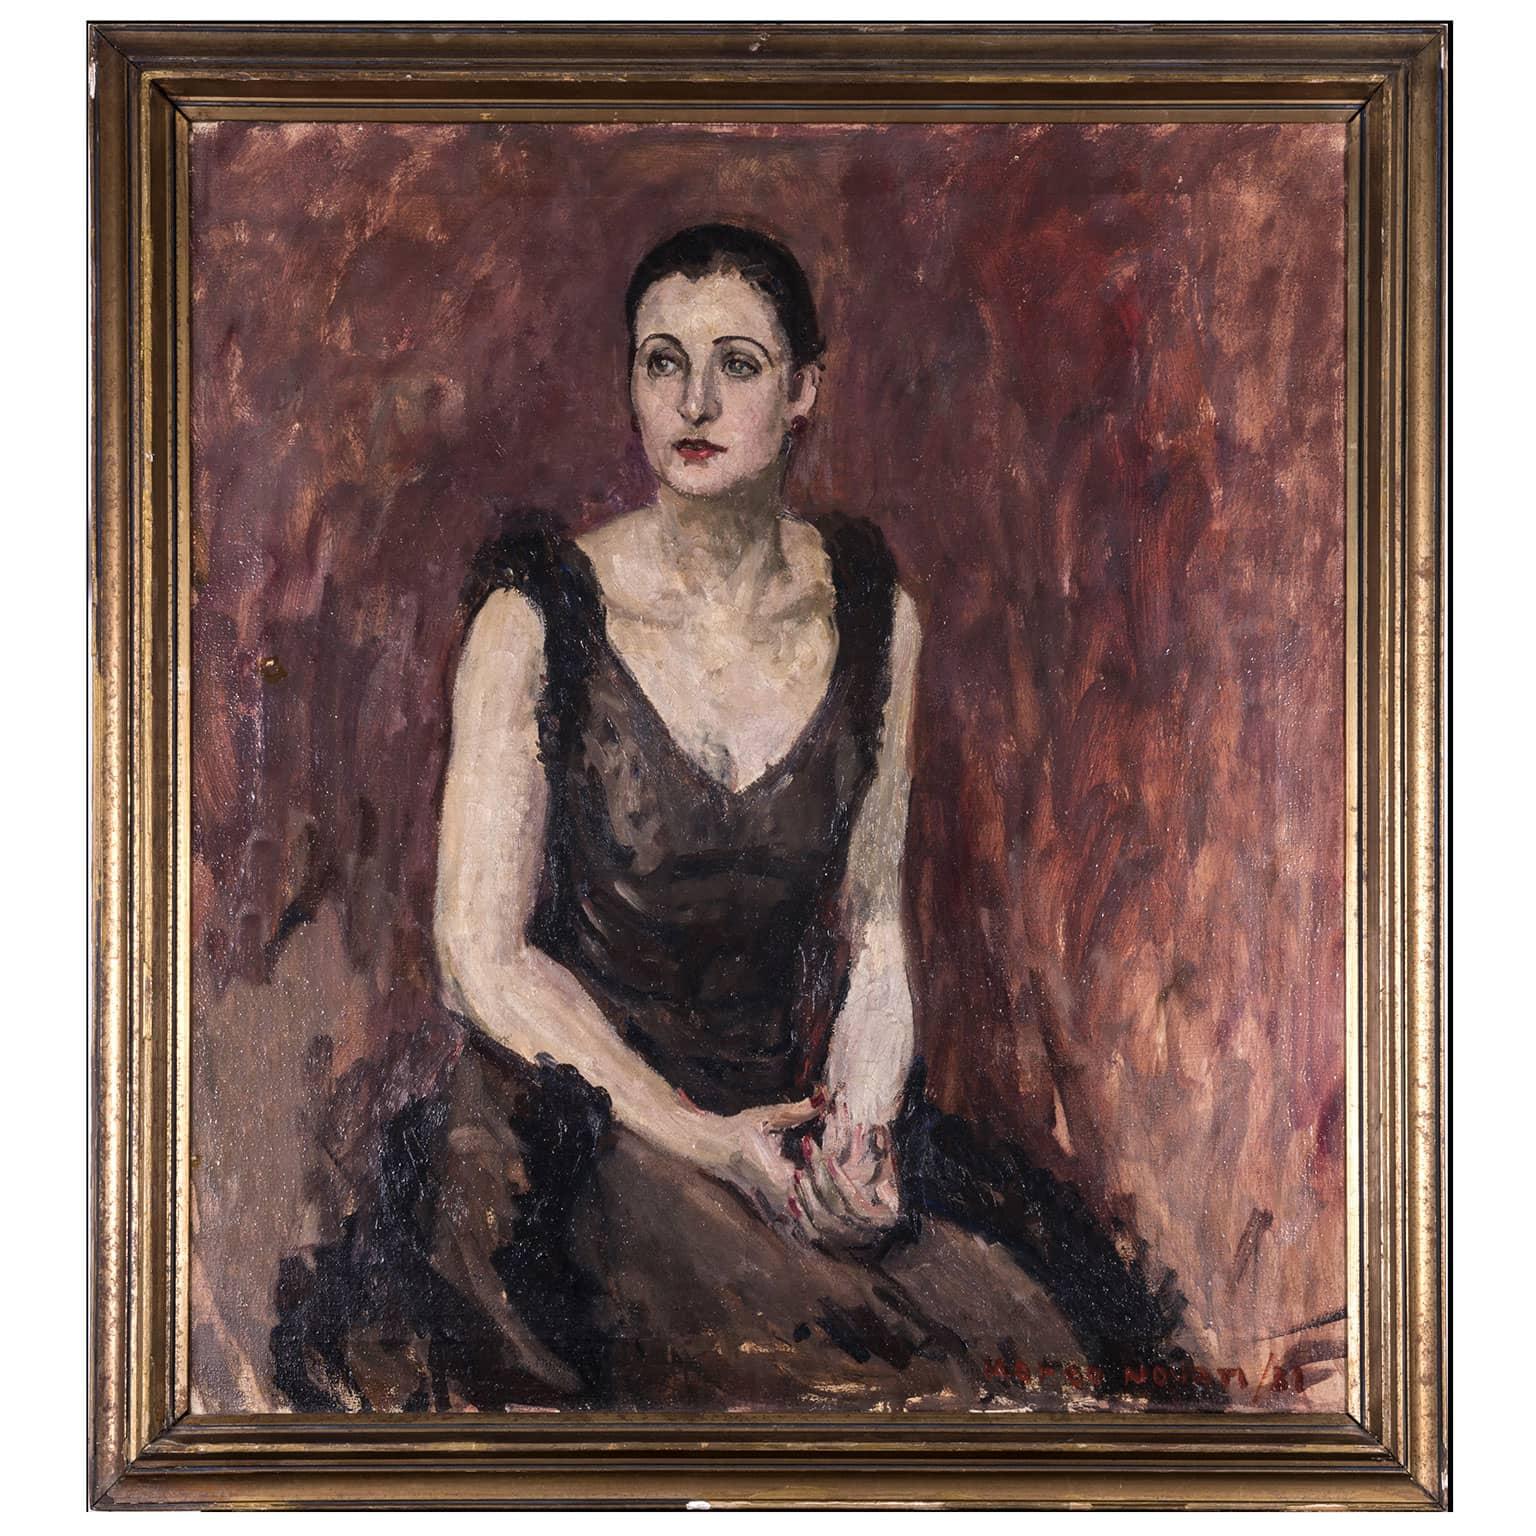 Paola Borboni (1900?995)